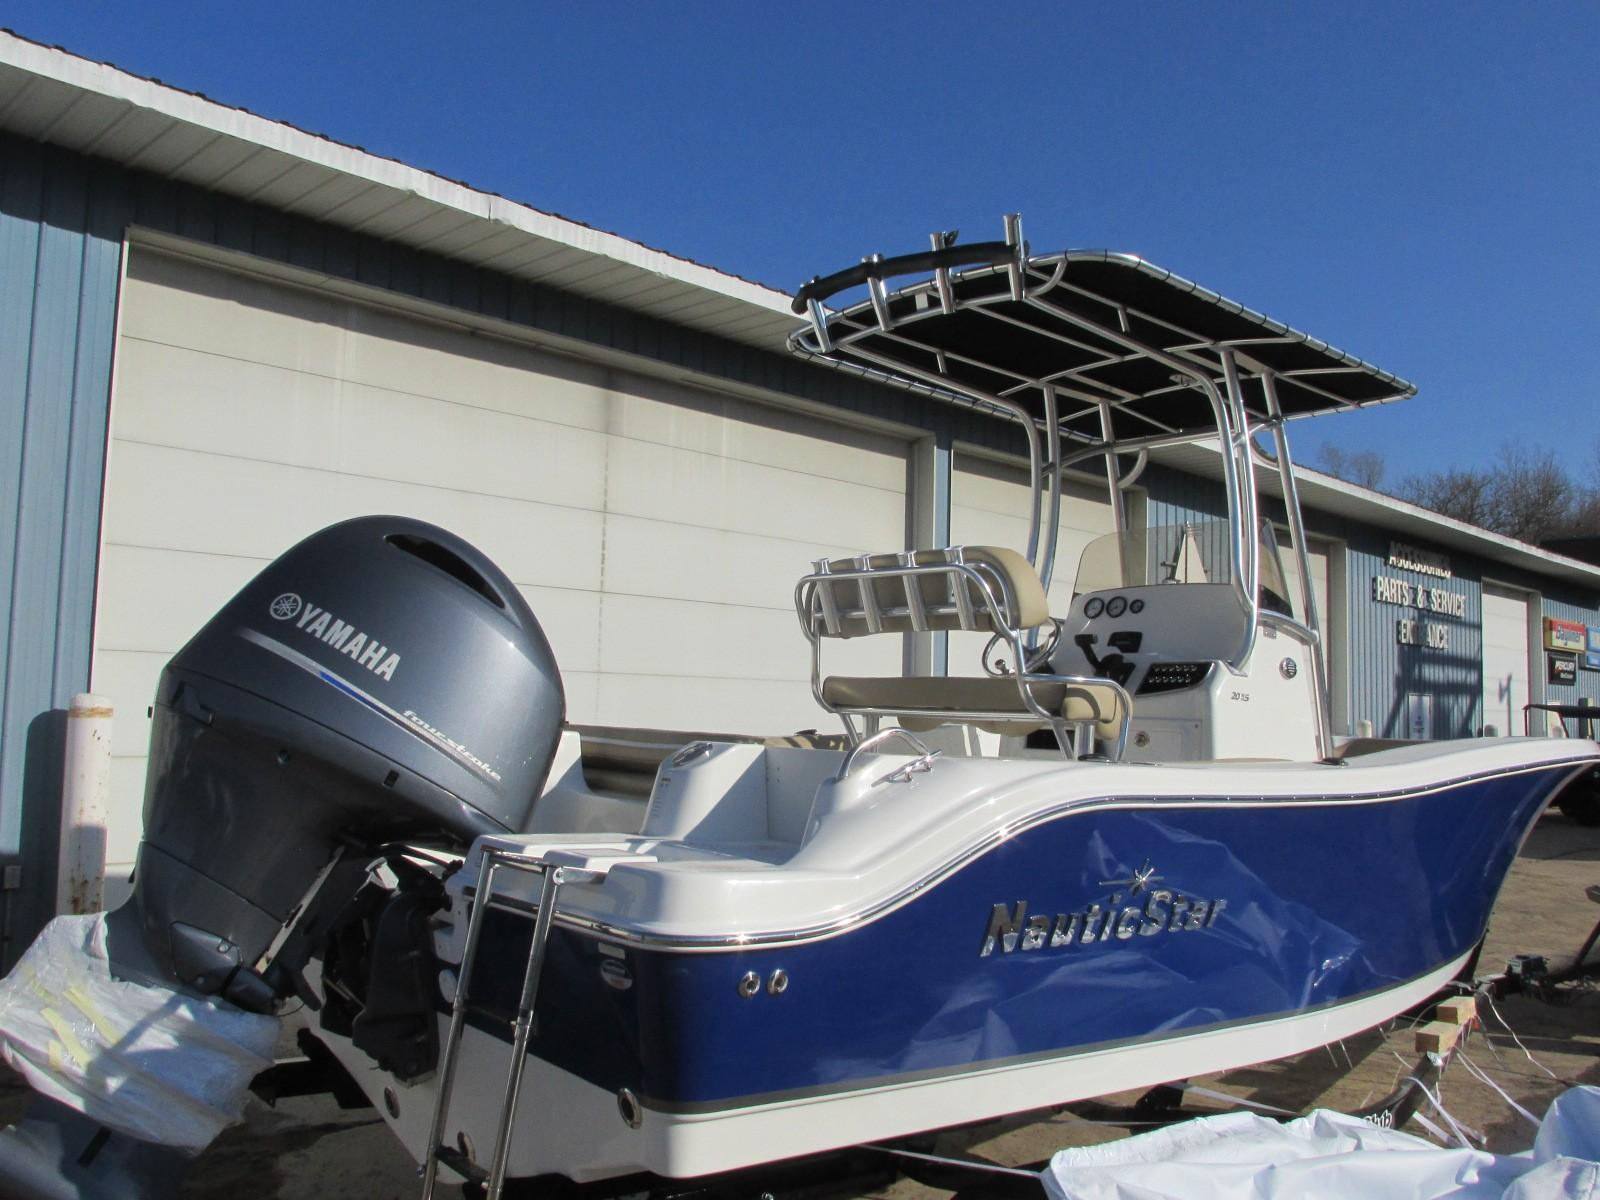 NauticStar20 XS Offshore